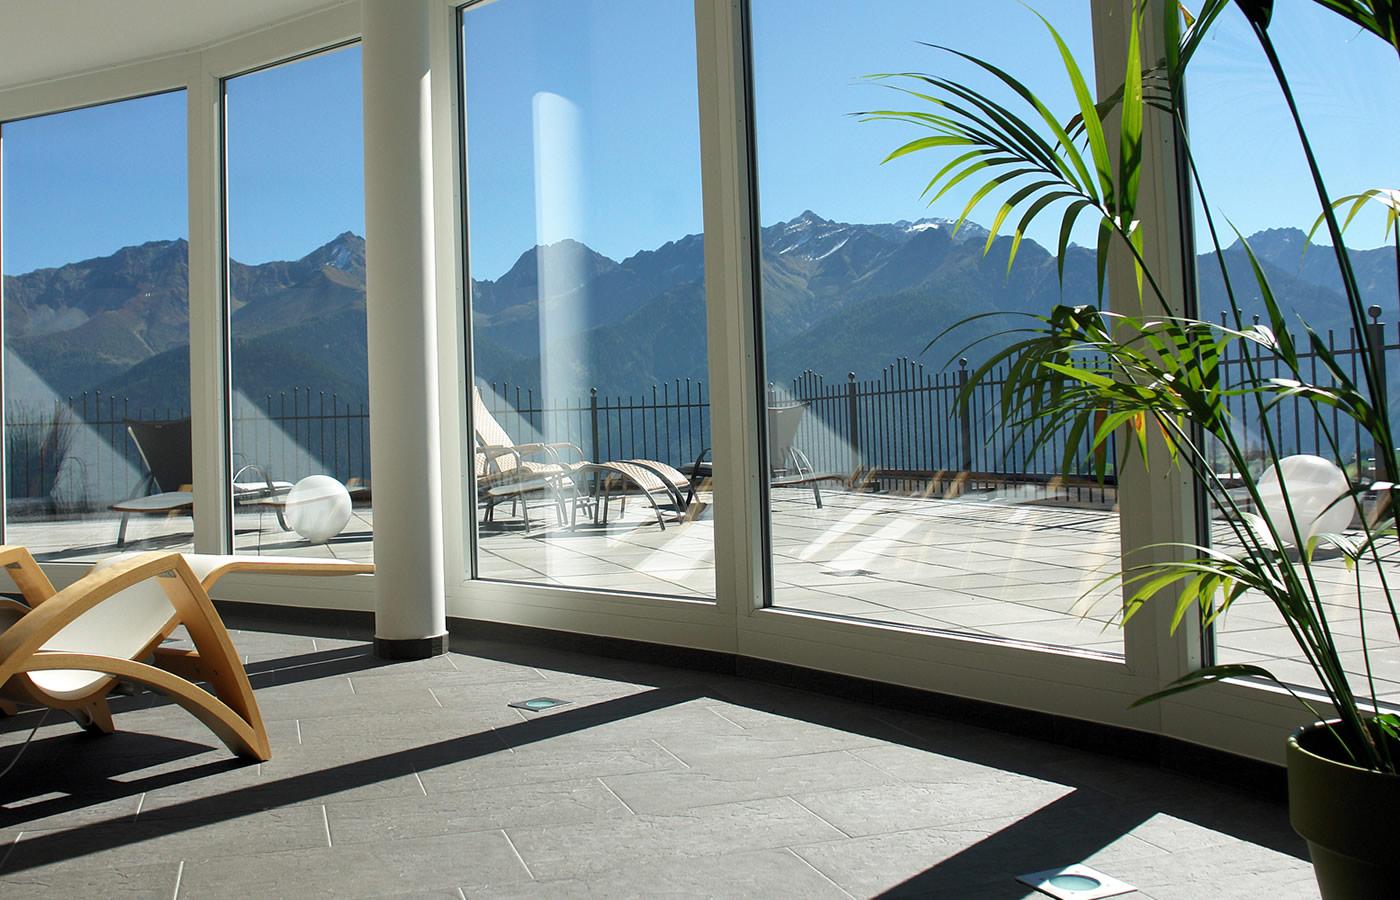 Wellnessen mit Panoramablick über Serfaus-Fiss-Ladis in Tirol.